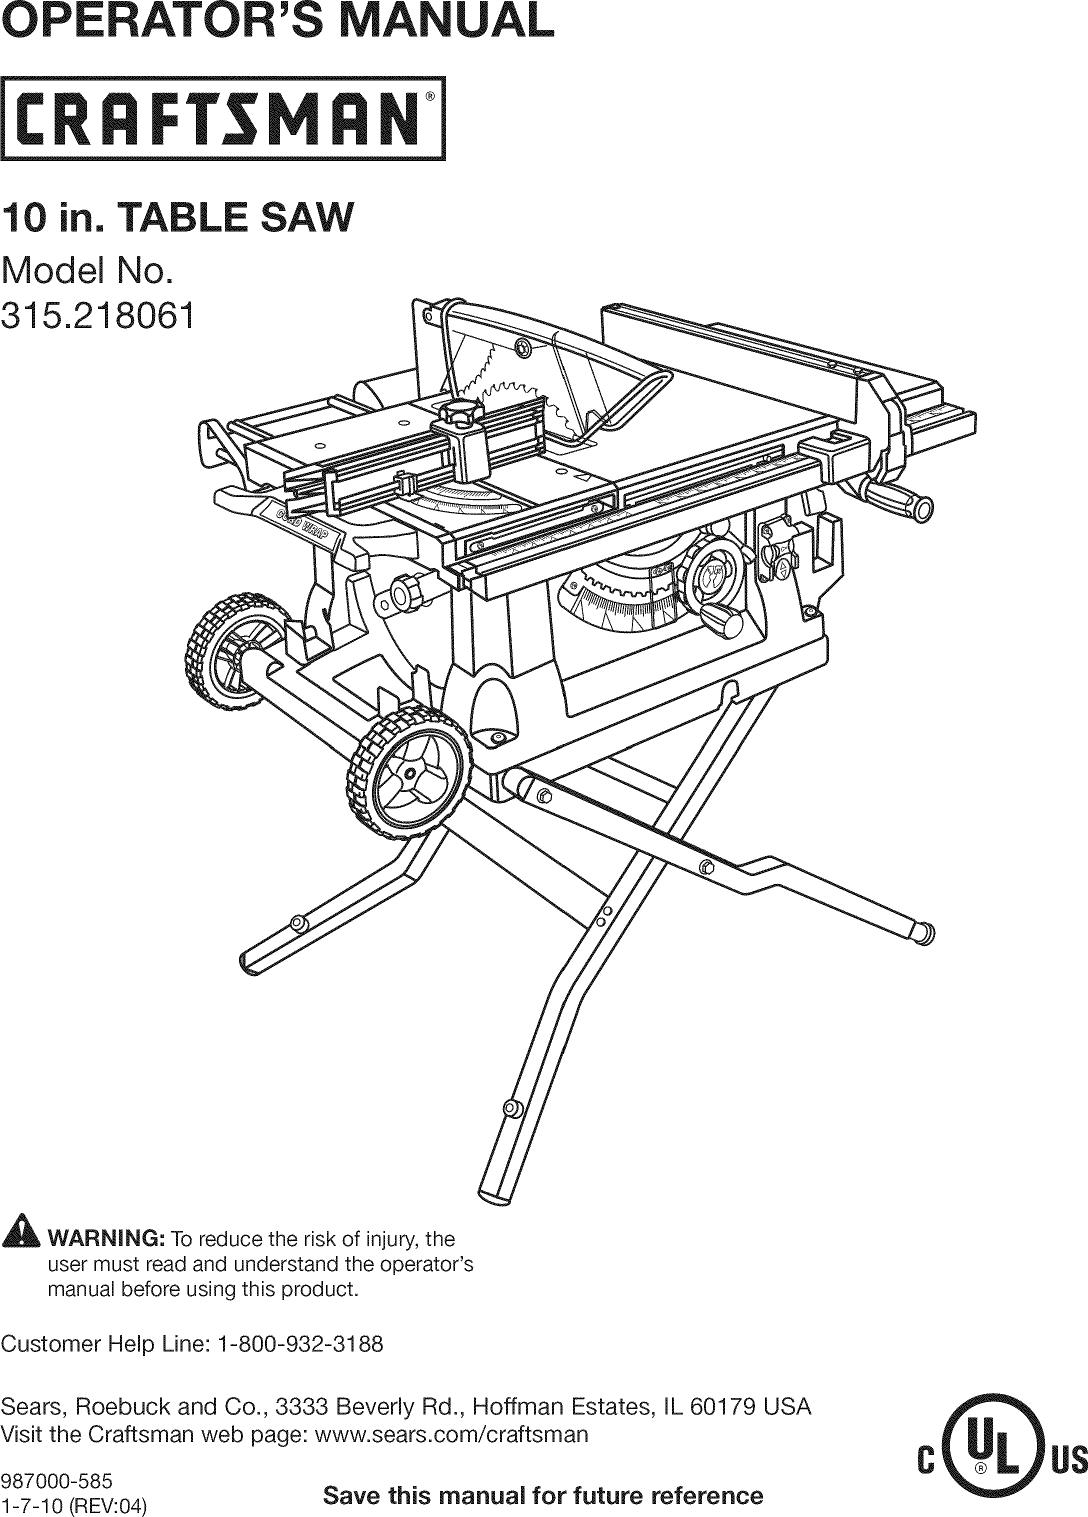 Craftsman Chainsaw User Manual